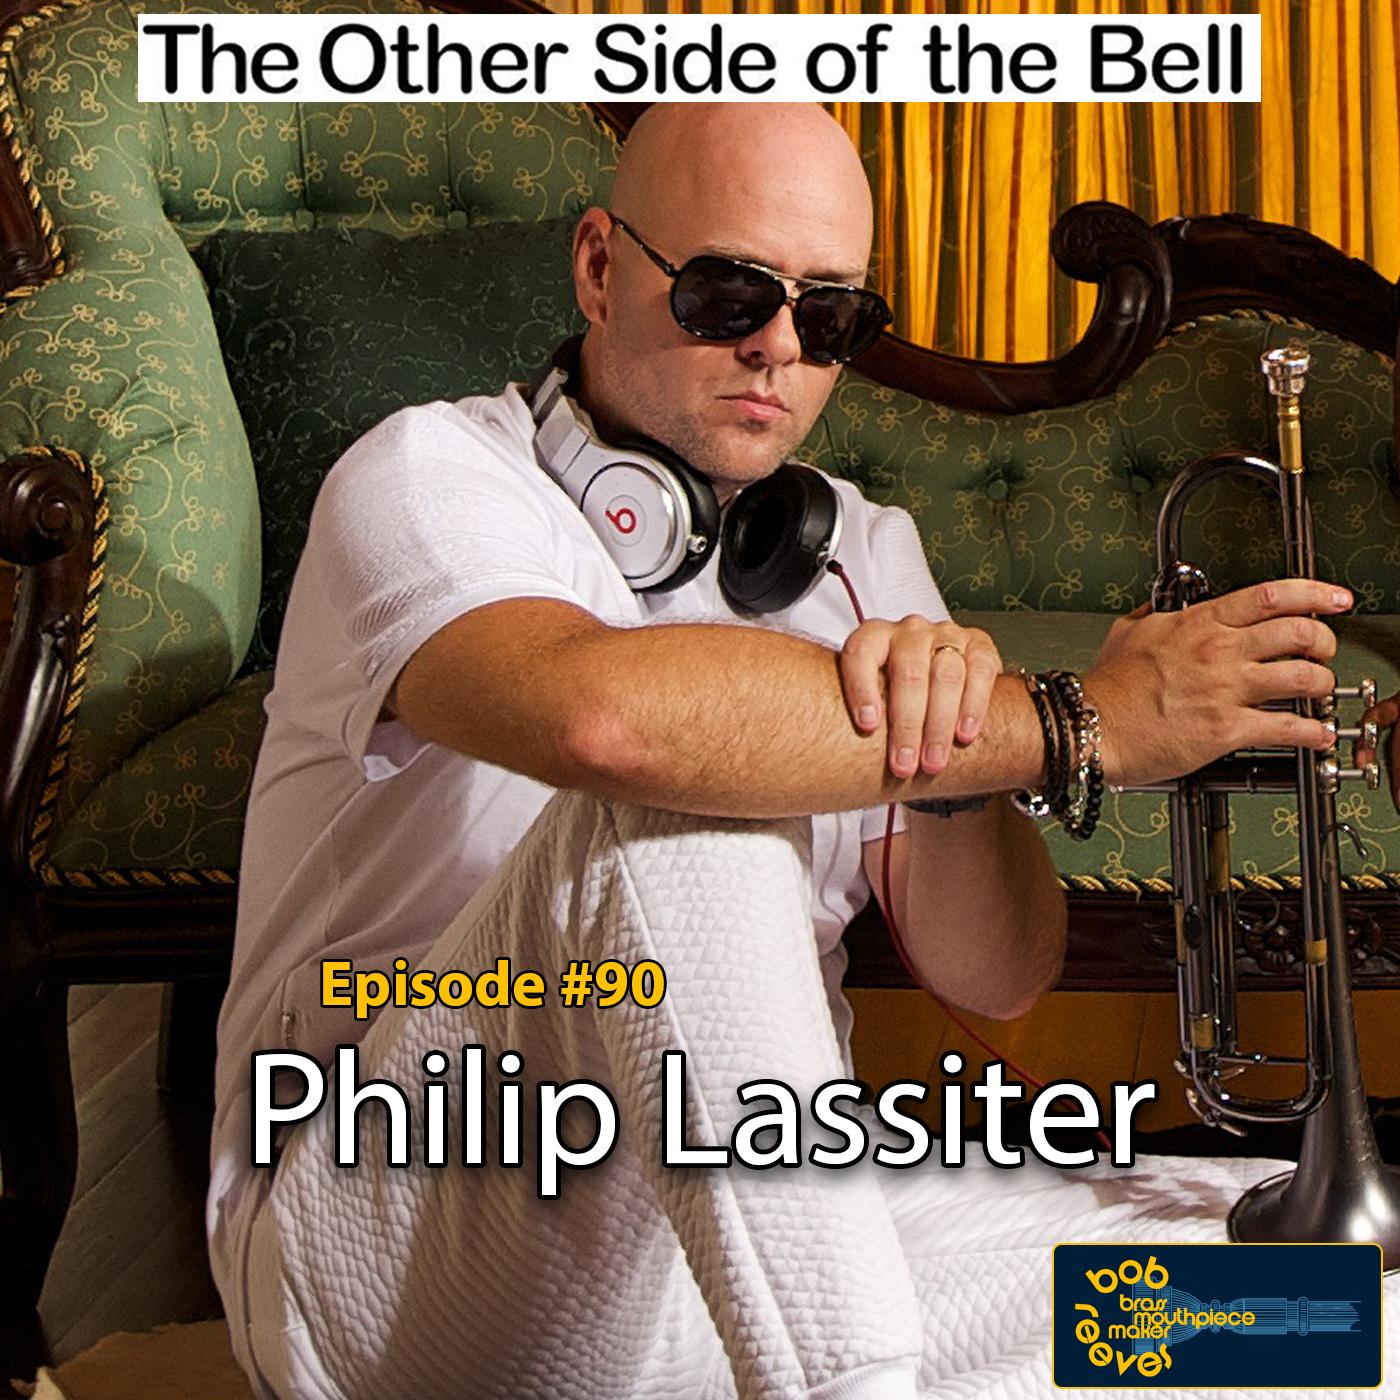 Logo for Philip Lassiter podcast episode